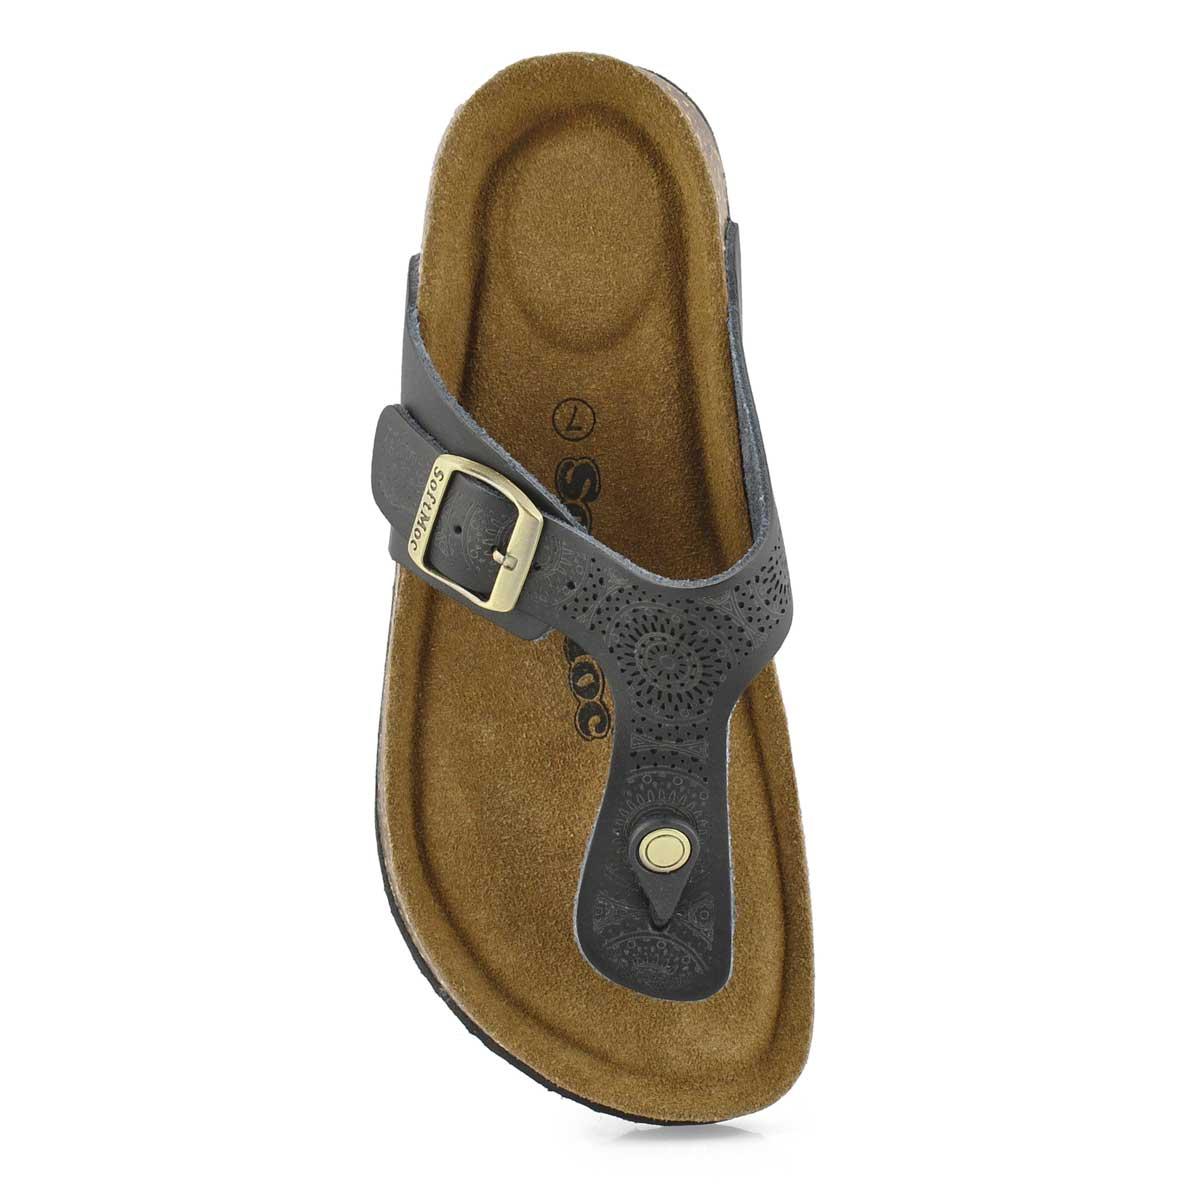 Lds Angy 5 blk perf mem foam thng sandal